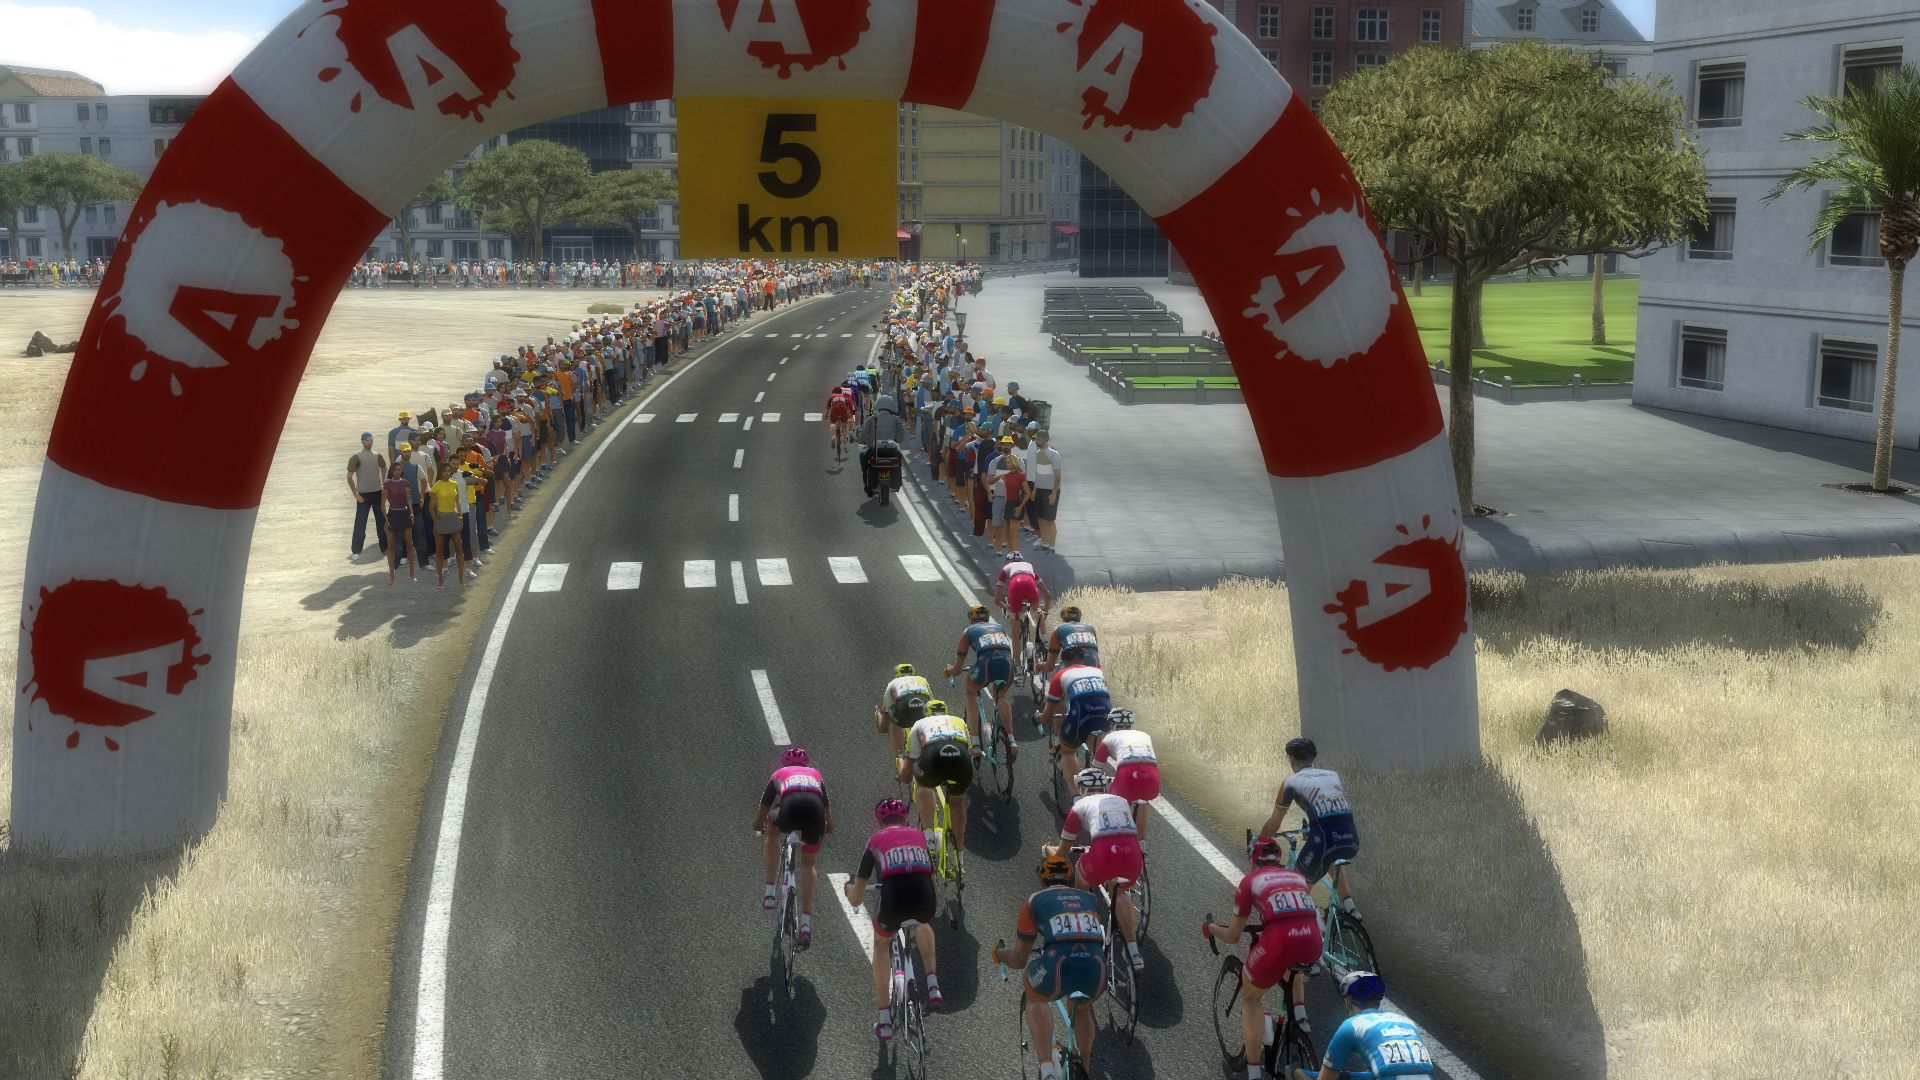 pcmdaily.com/images/mg/2019/Races/PT/Qatar/mg19_qat_s01_11.jpg